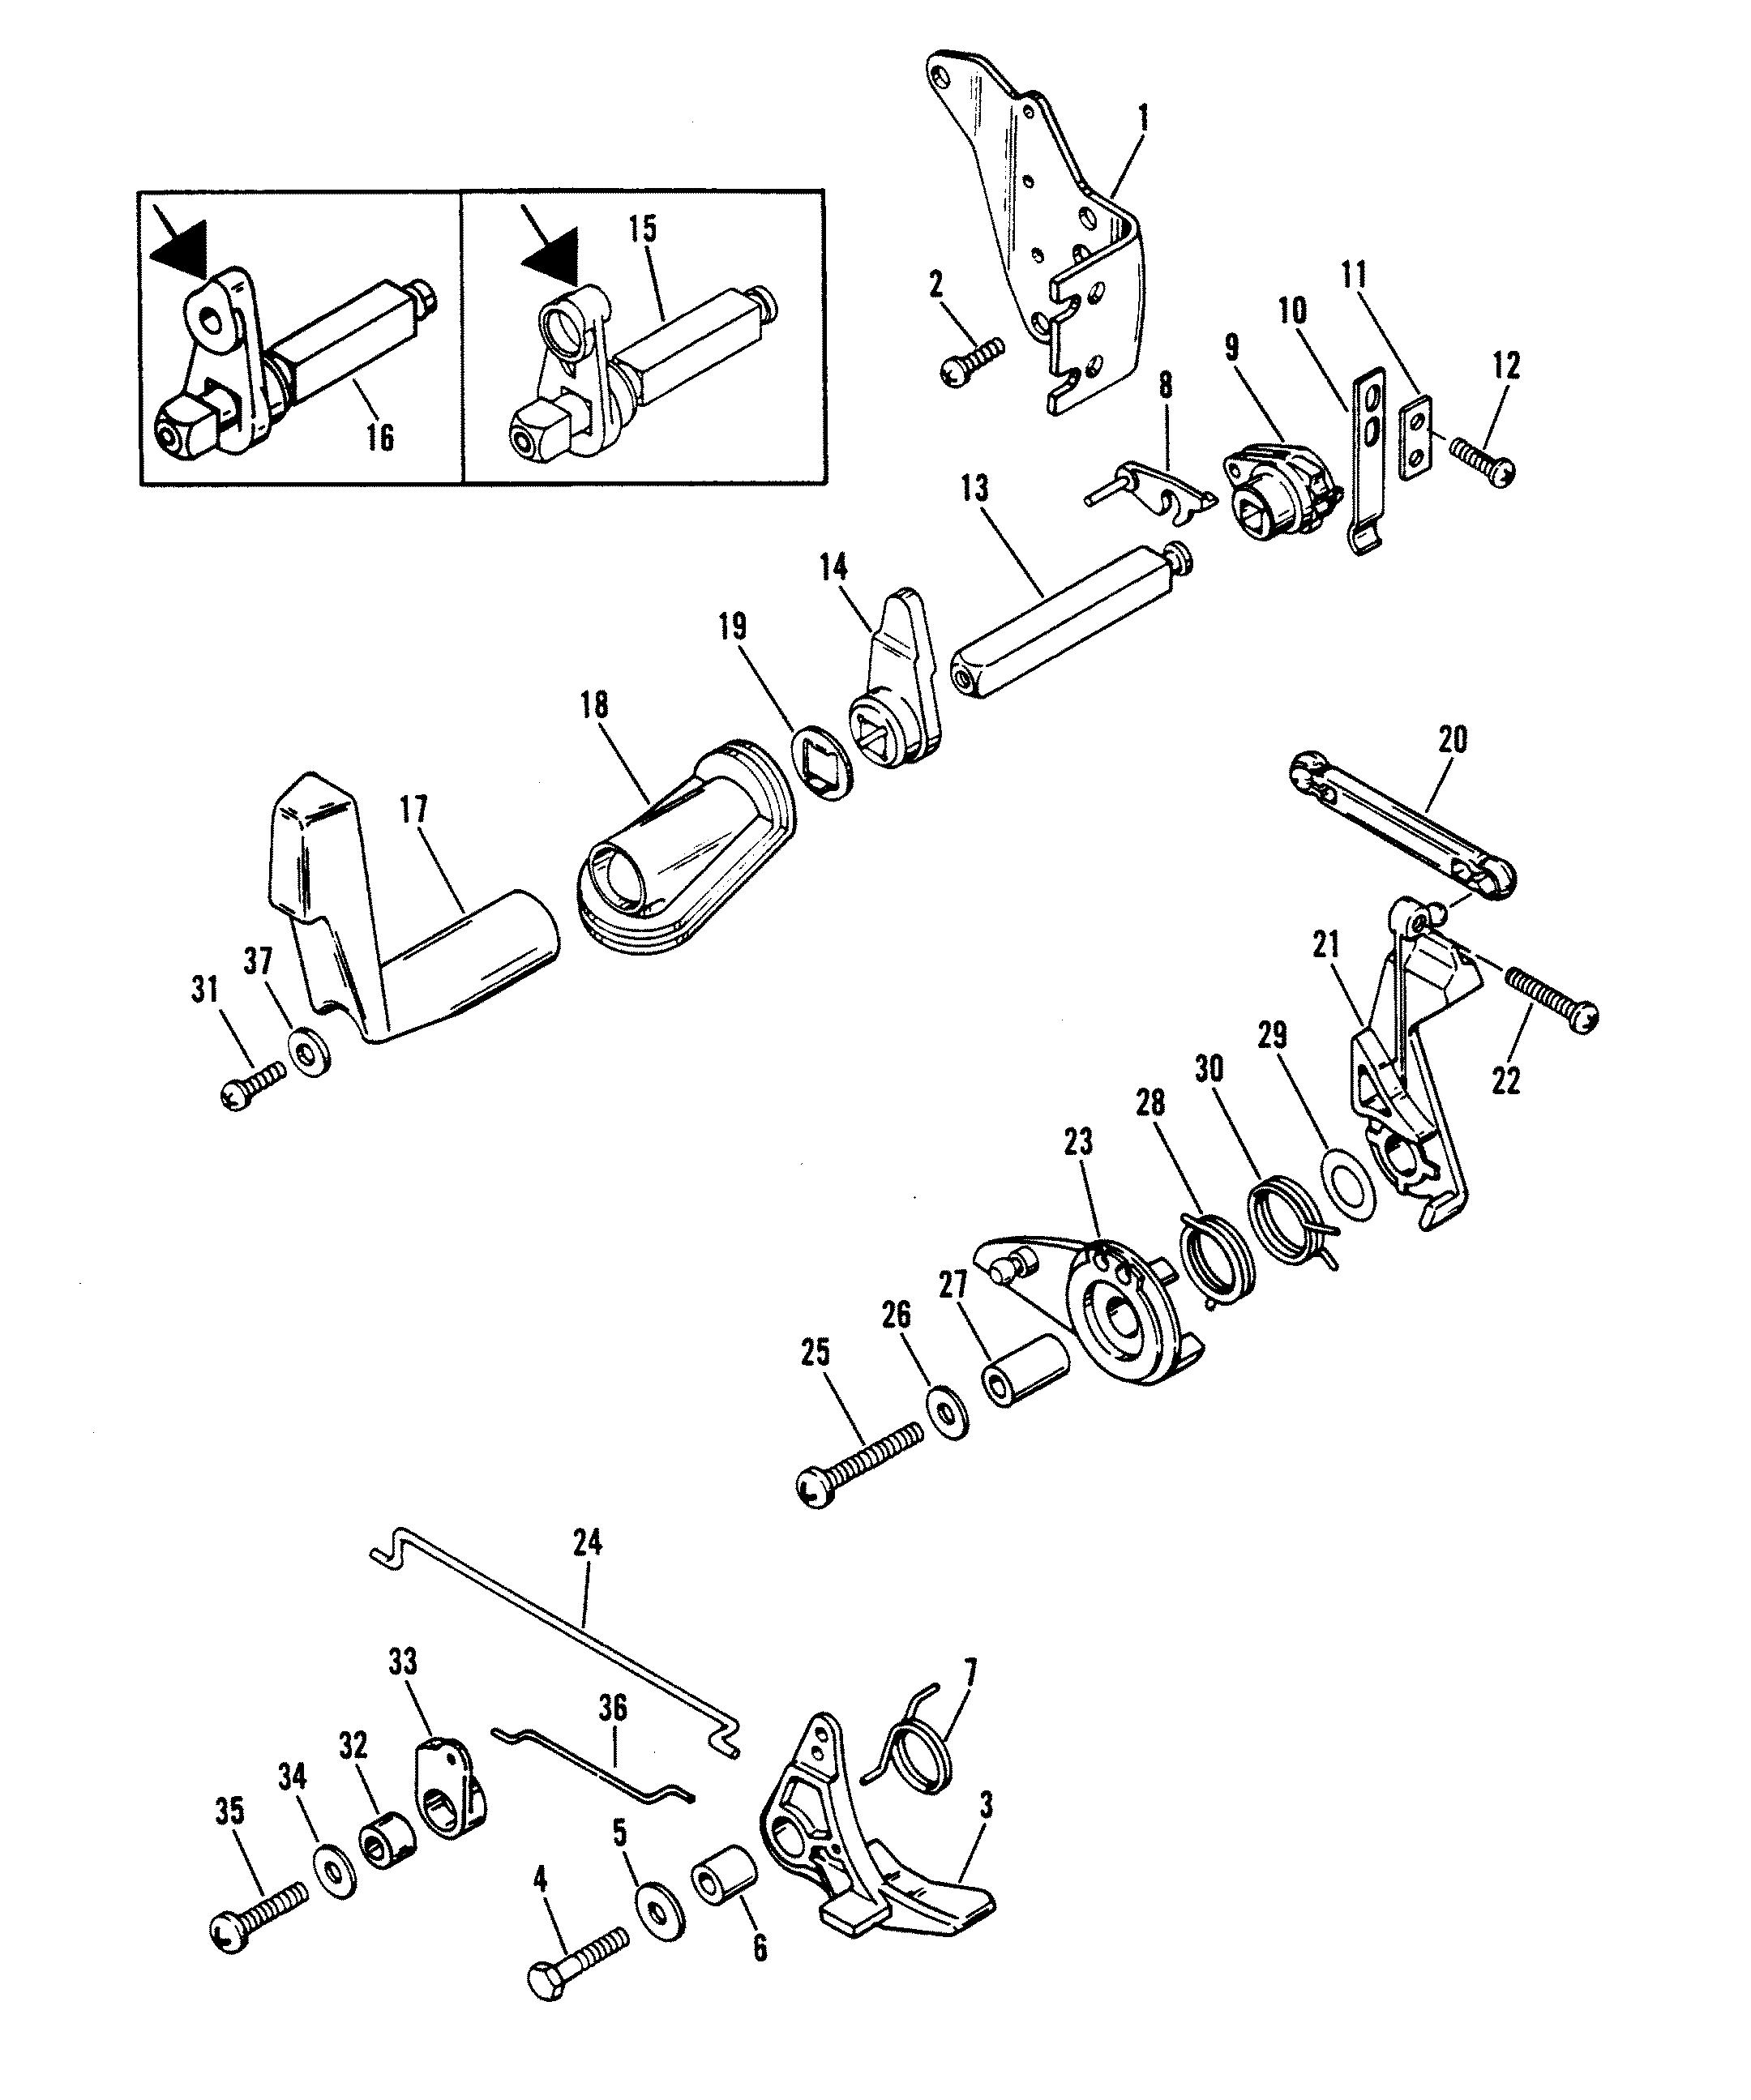 Mercury Outboard Throttle Control Diagram – name